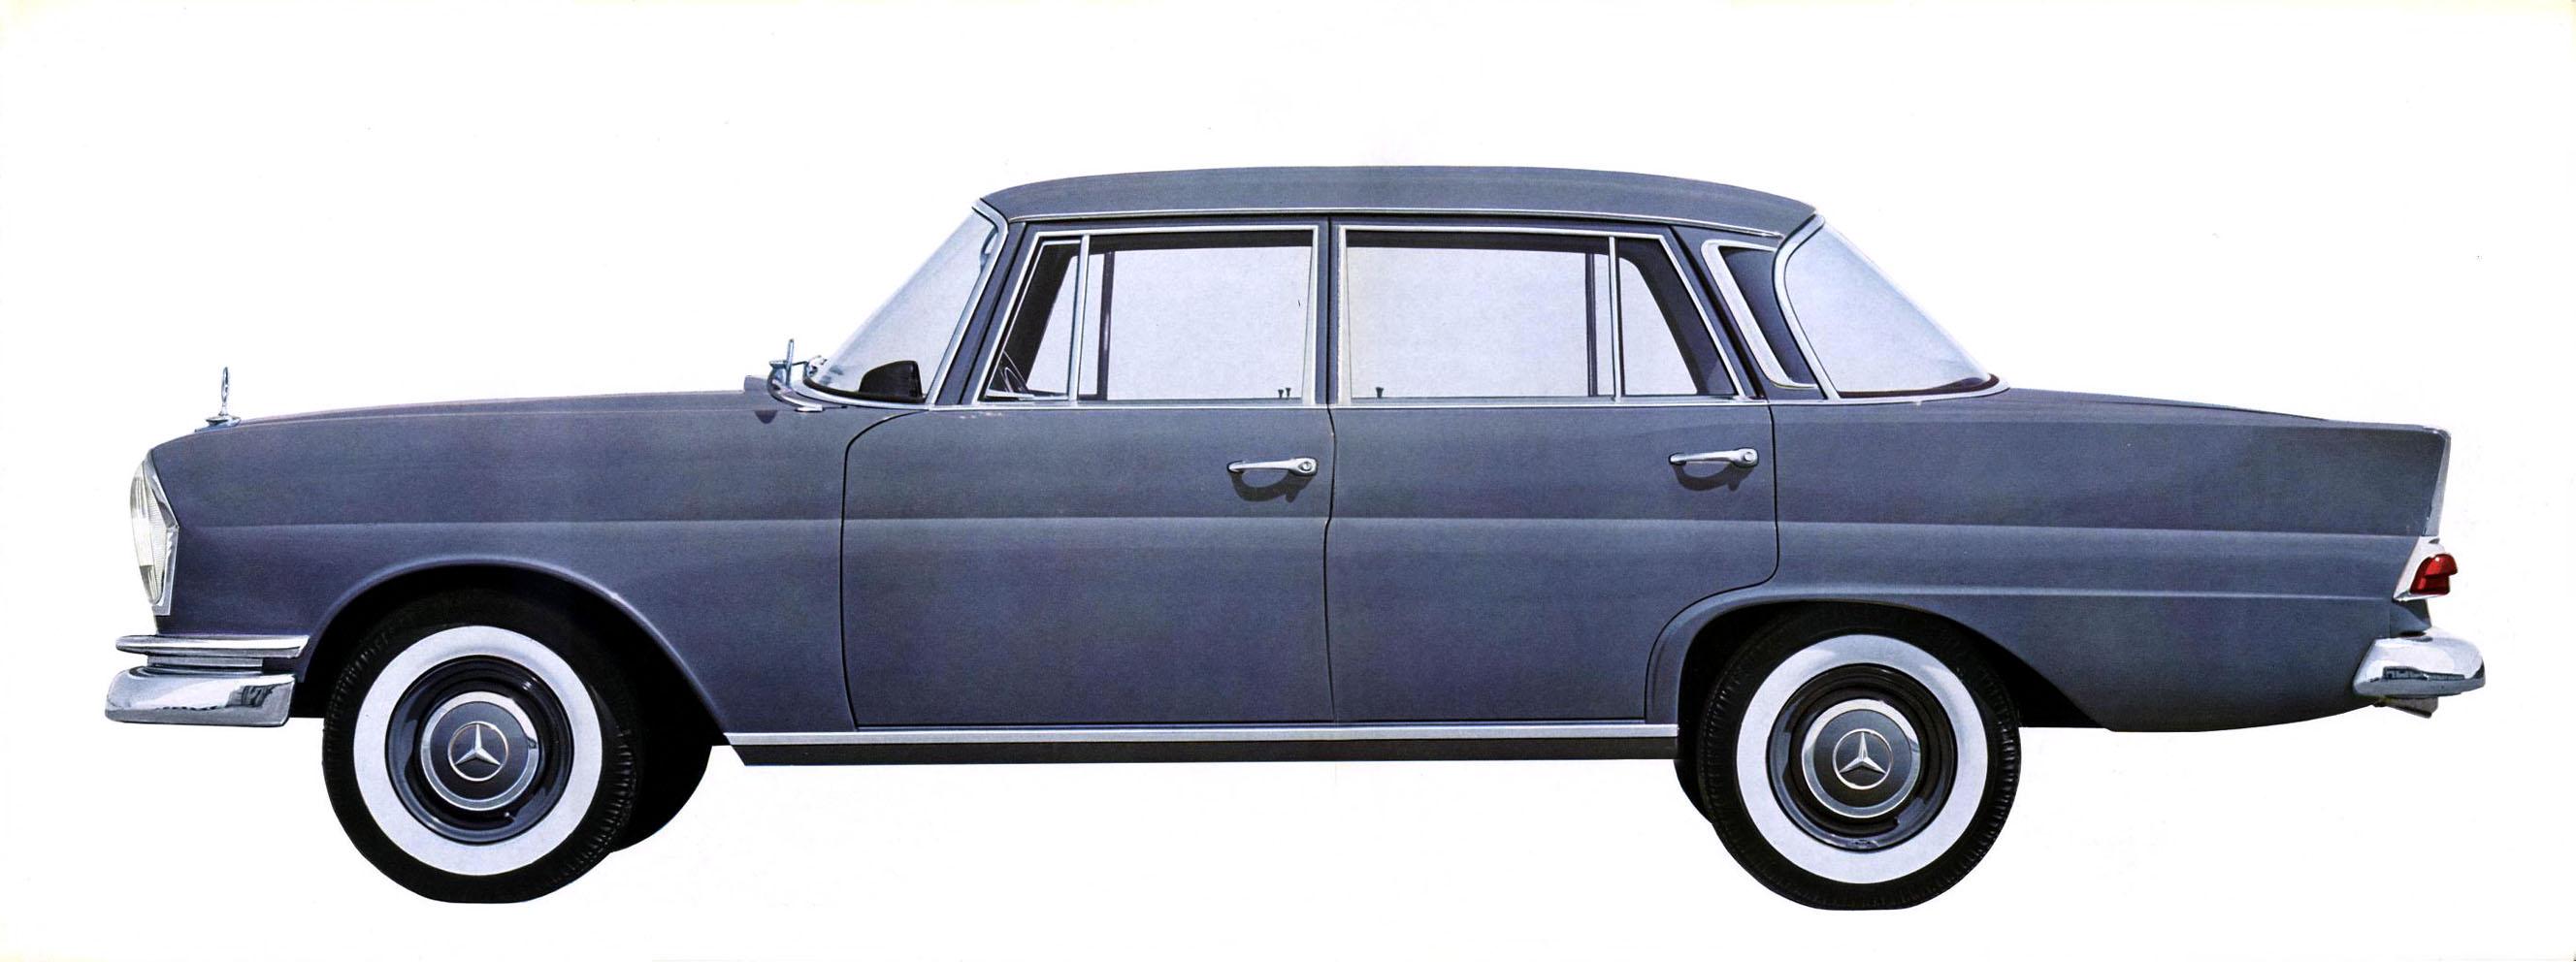 Hot cars: http://www.lov2xlr8.no/brochures/others5/62mbi/62mbi.html